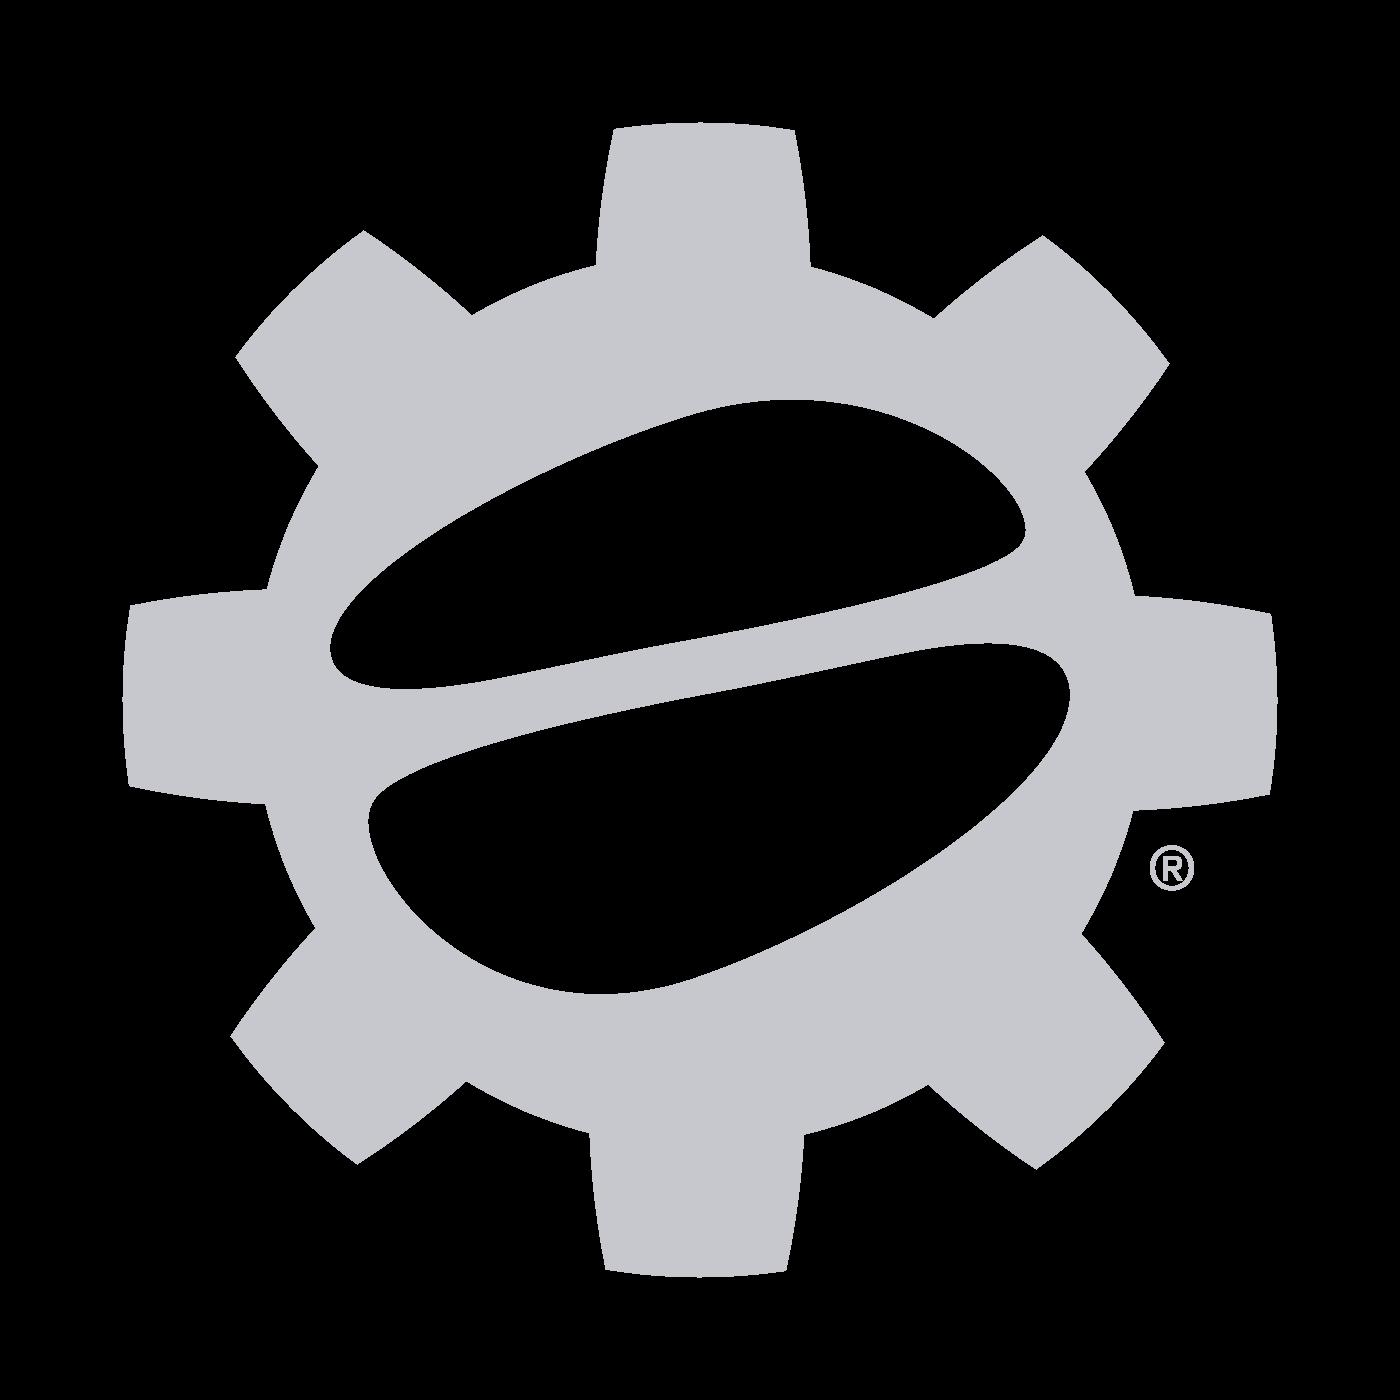 Philips 4300 Superautomatic Espresso Machine (Certified Refurbished)